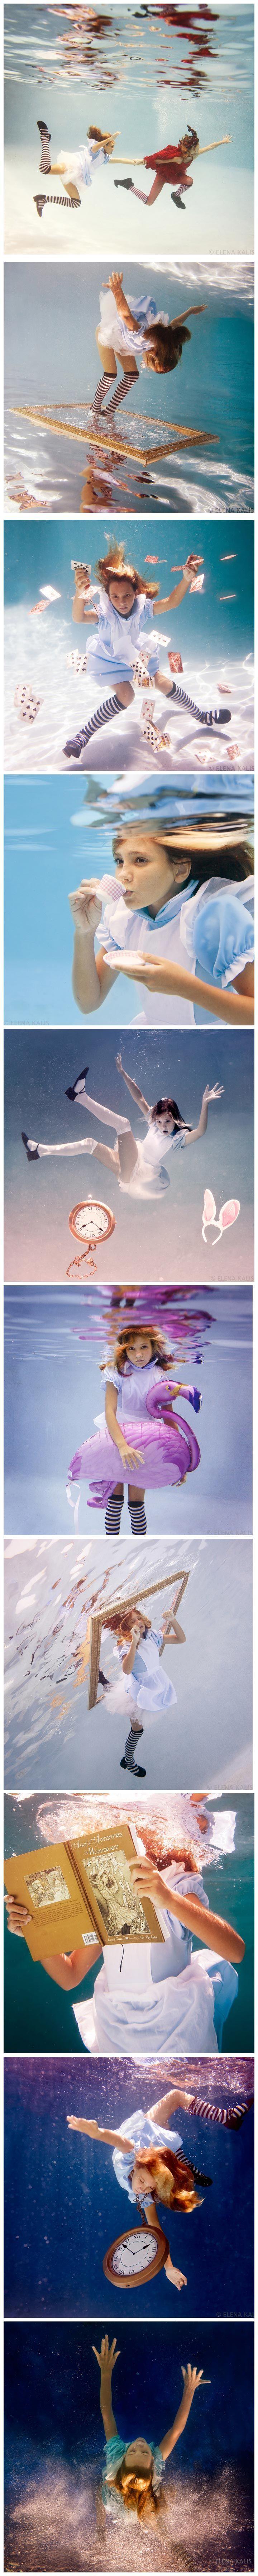 #wonderlandinspired #underwater #beautiful #photos #alice